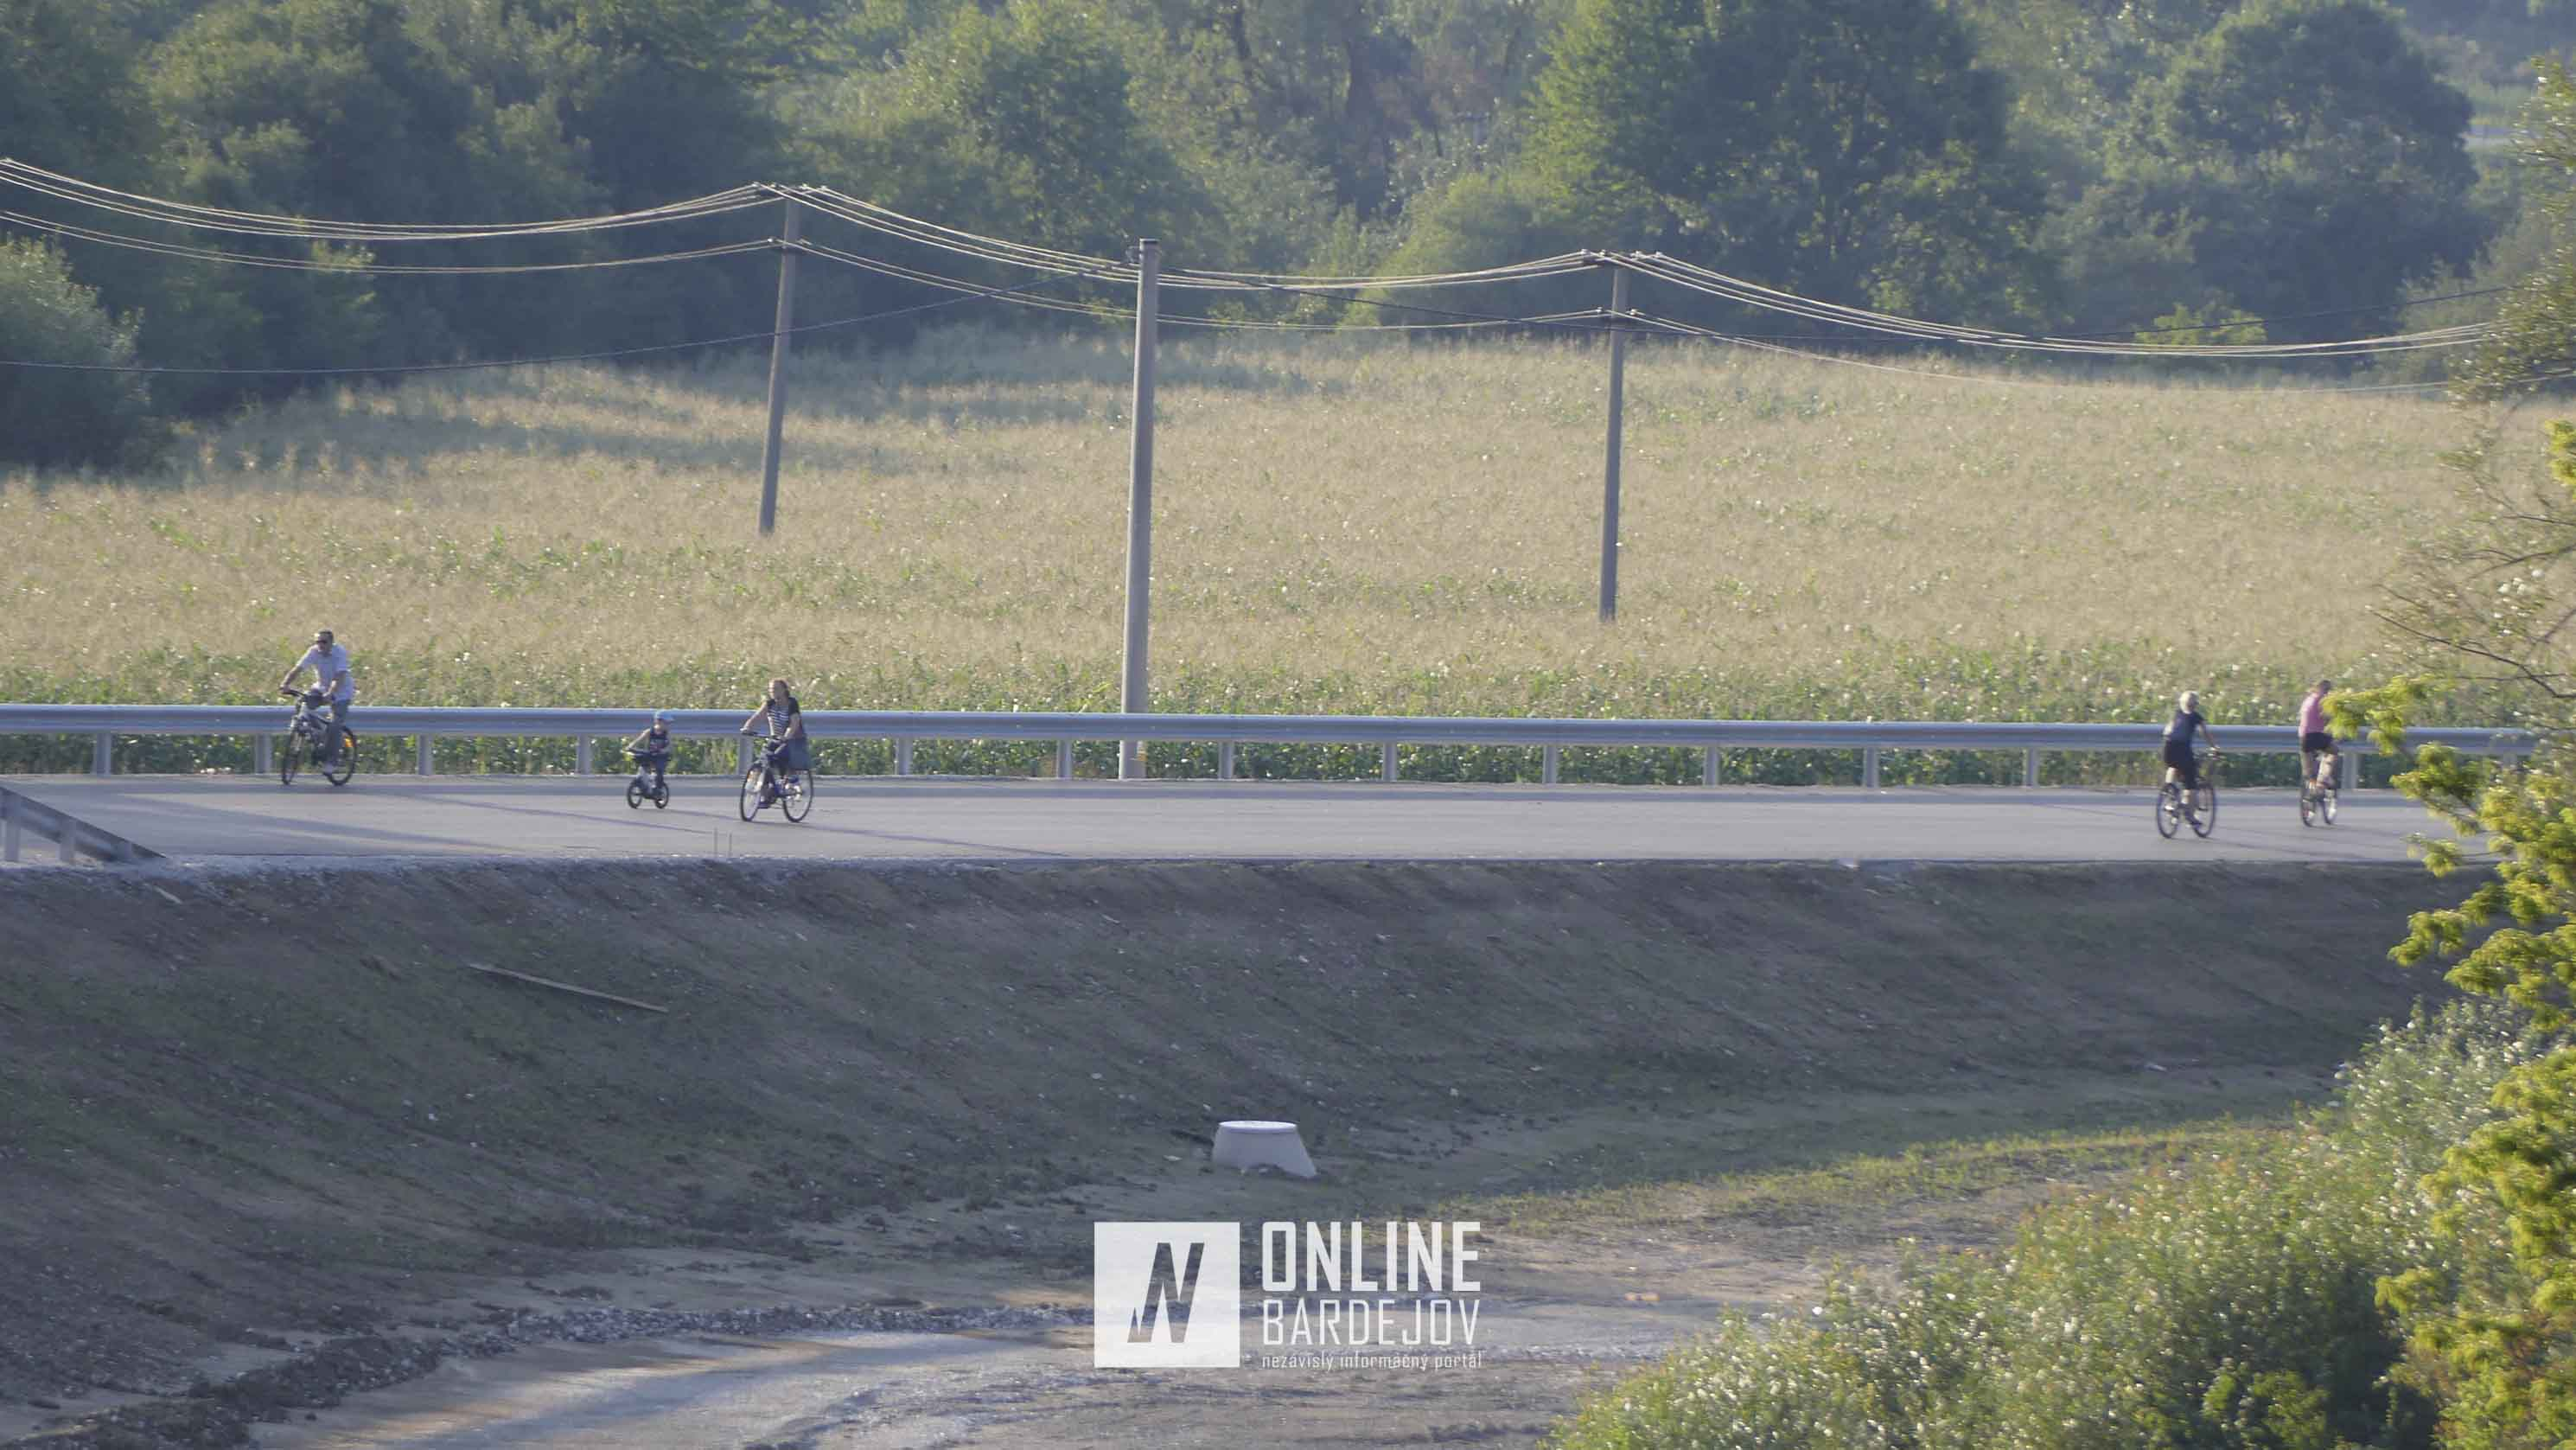 Juhozápadný obchvat mesta a cyklisti